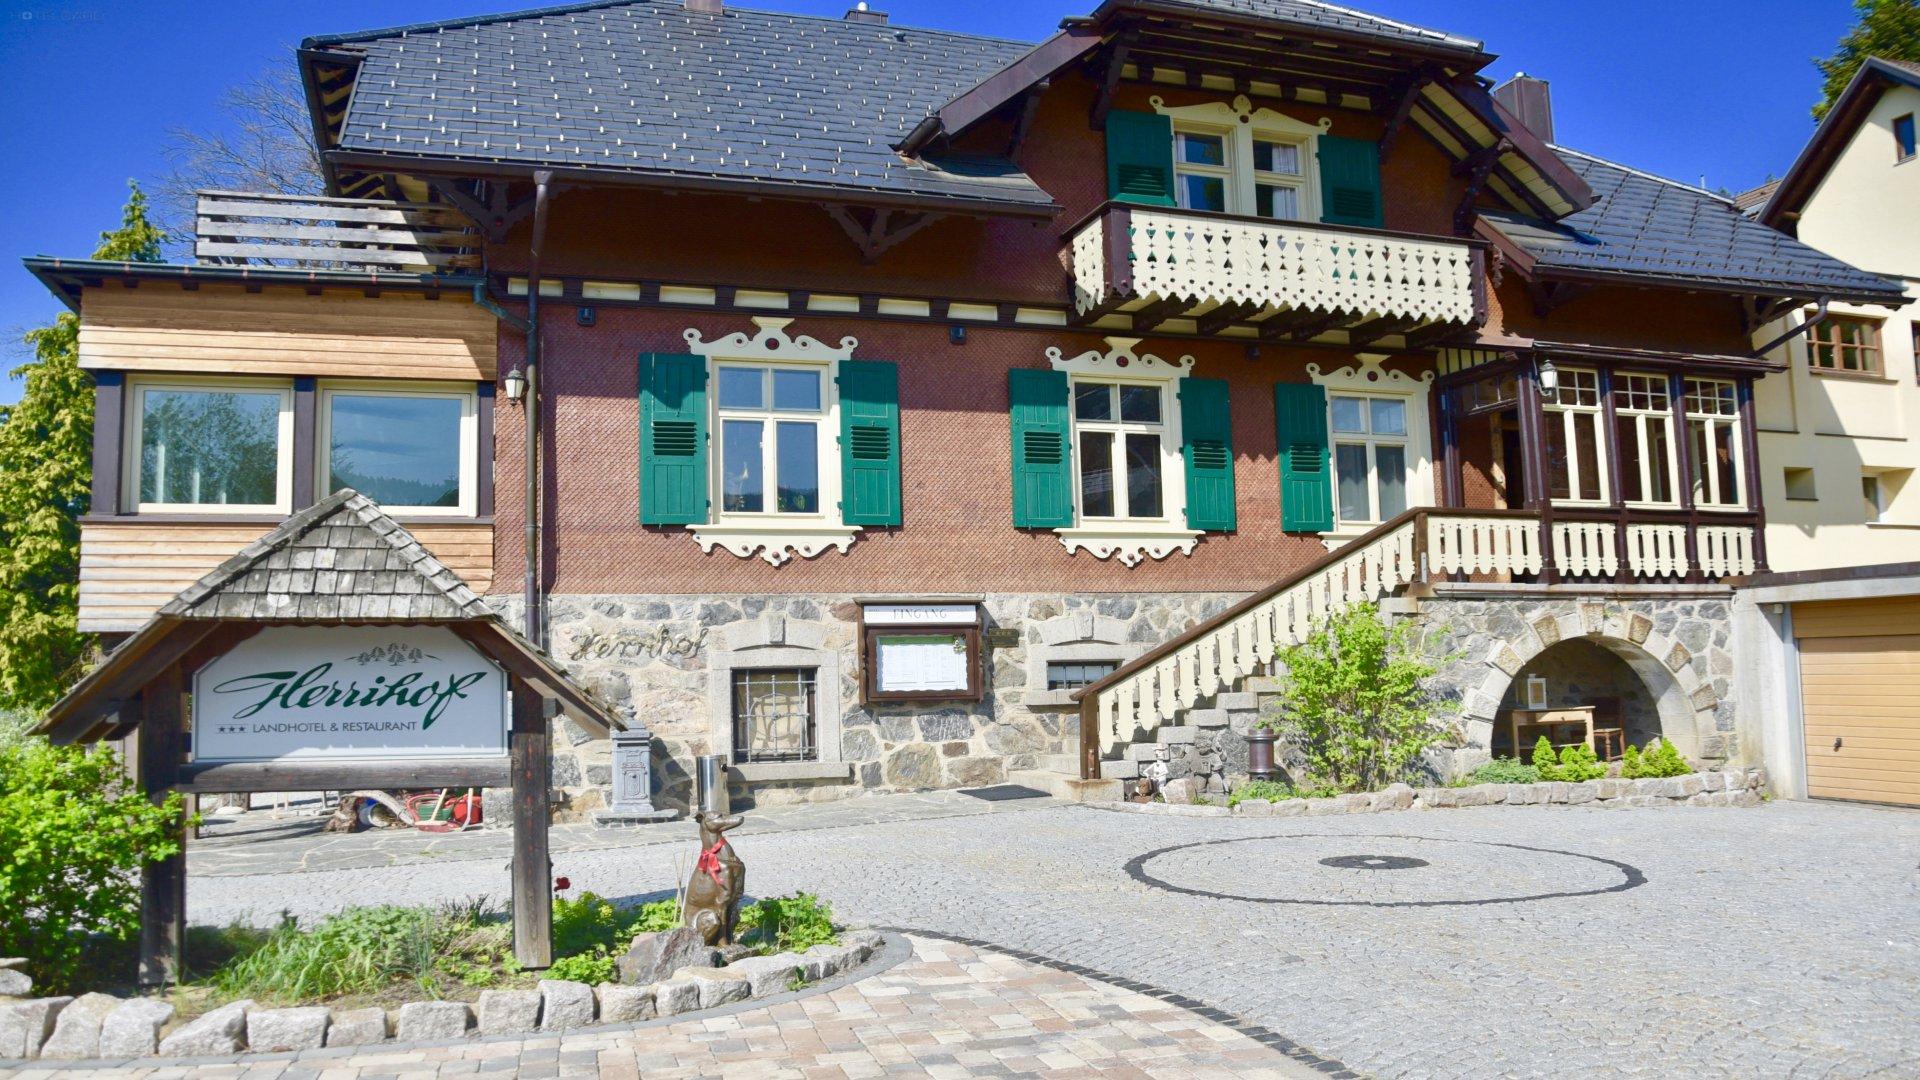 Hotel & Chalets Herrihof 2